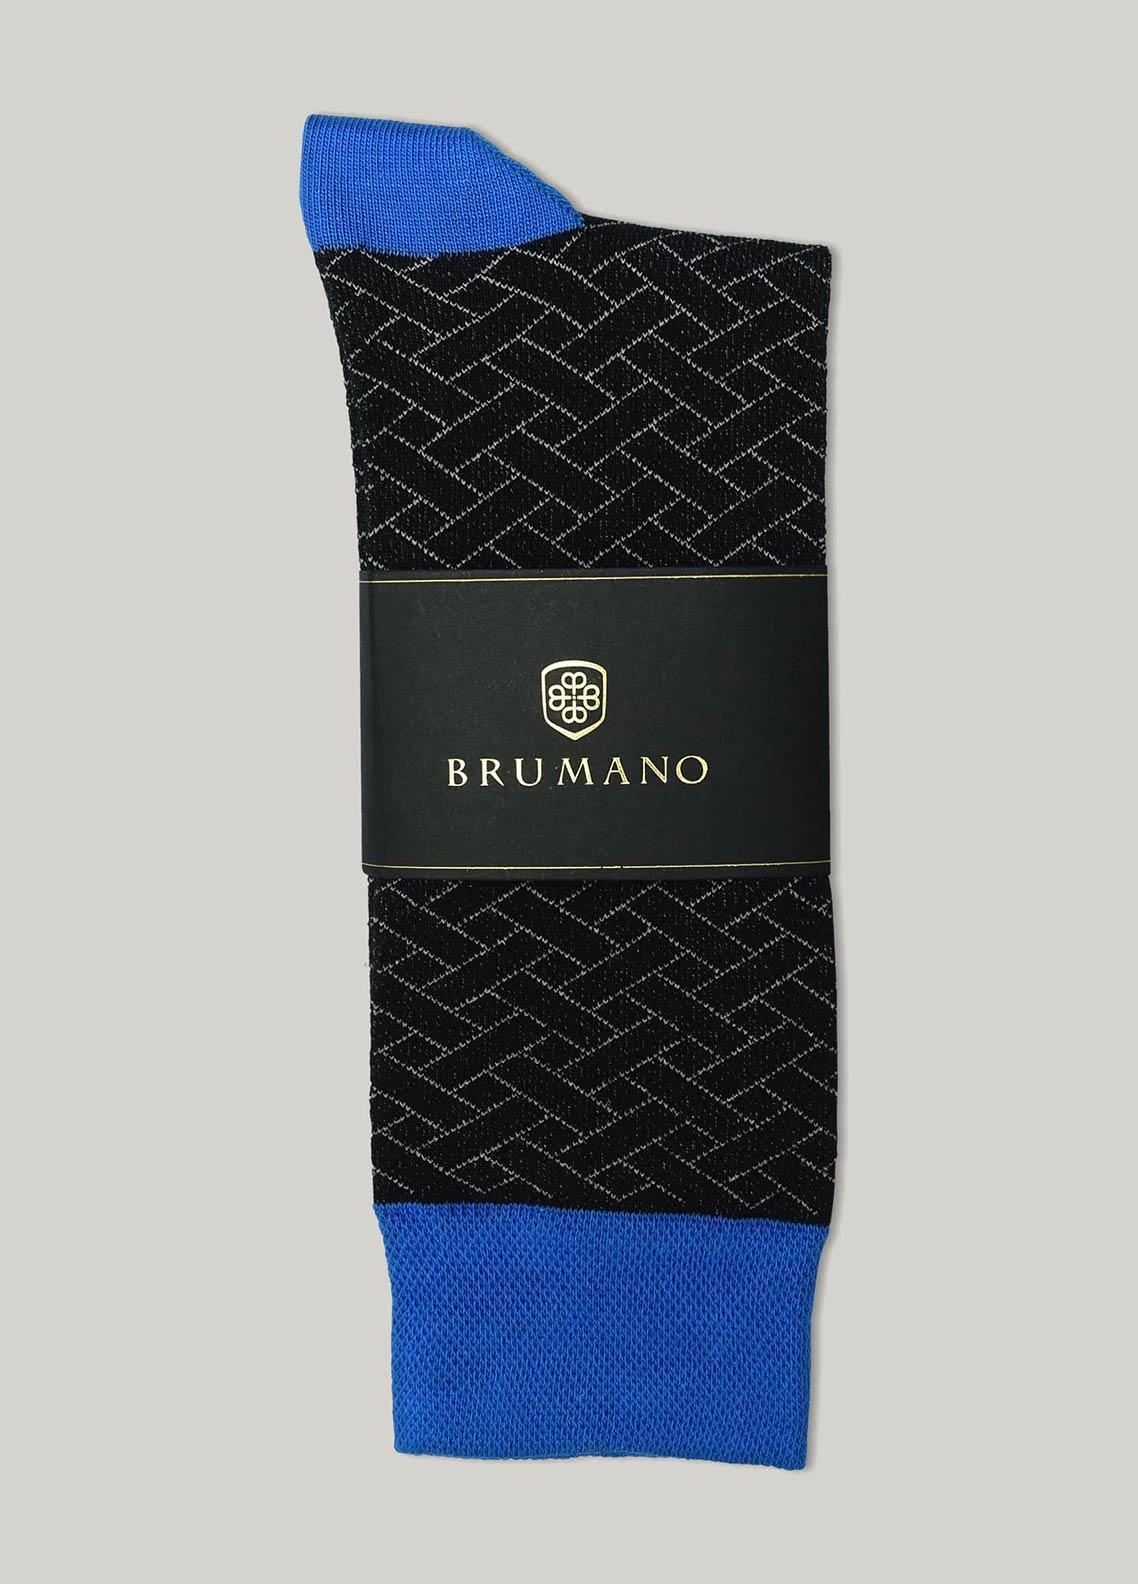 Brumano Cotton Socks BM20CSK Black & Royal Blue Cotton Socks